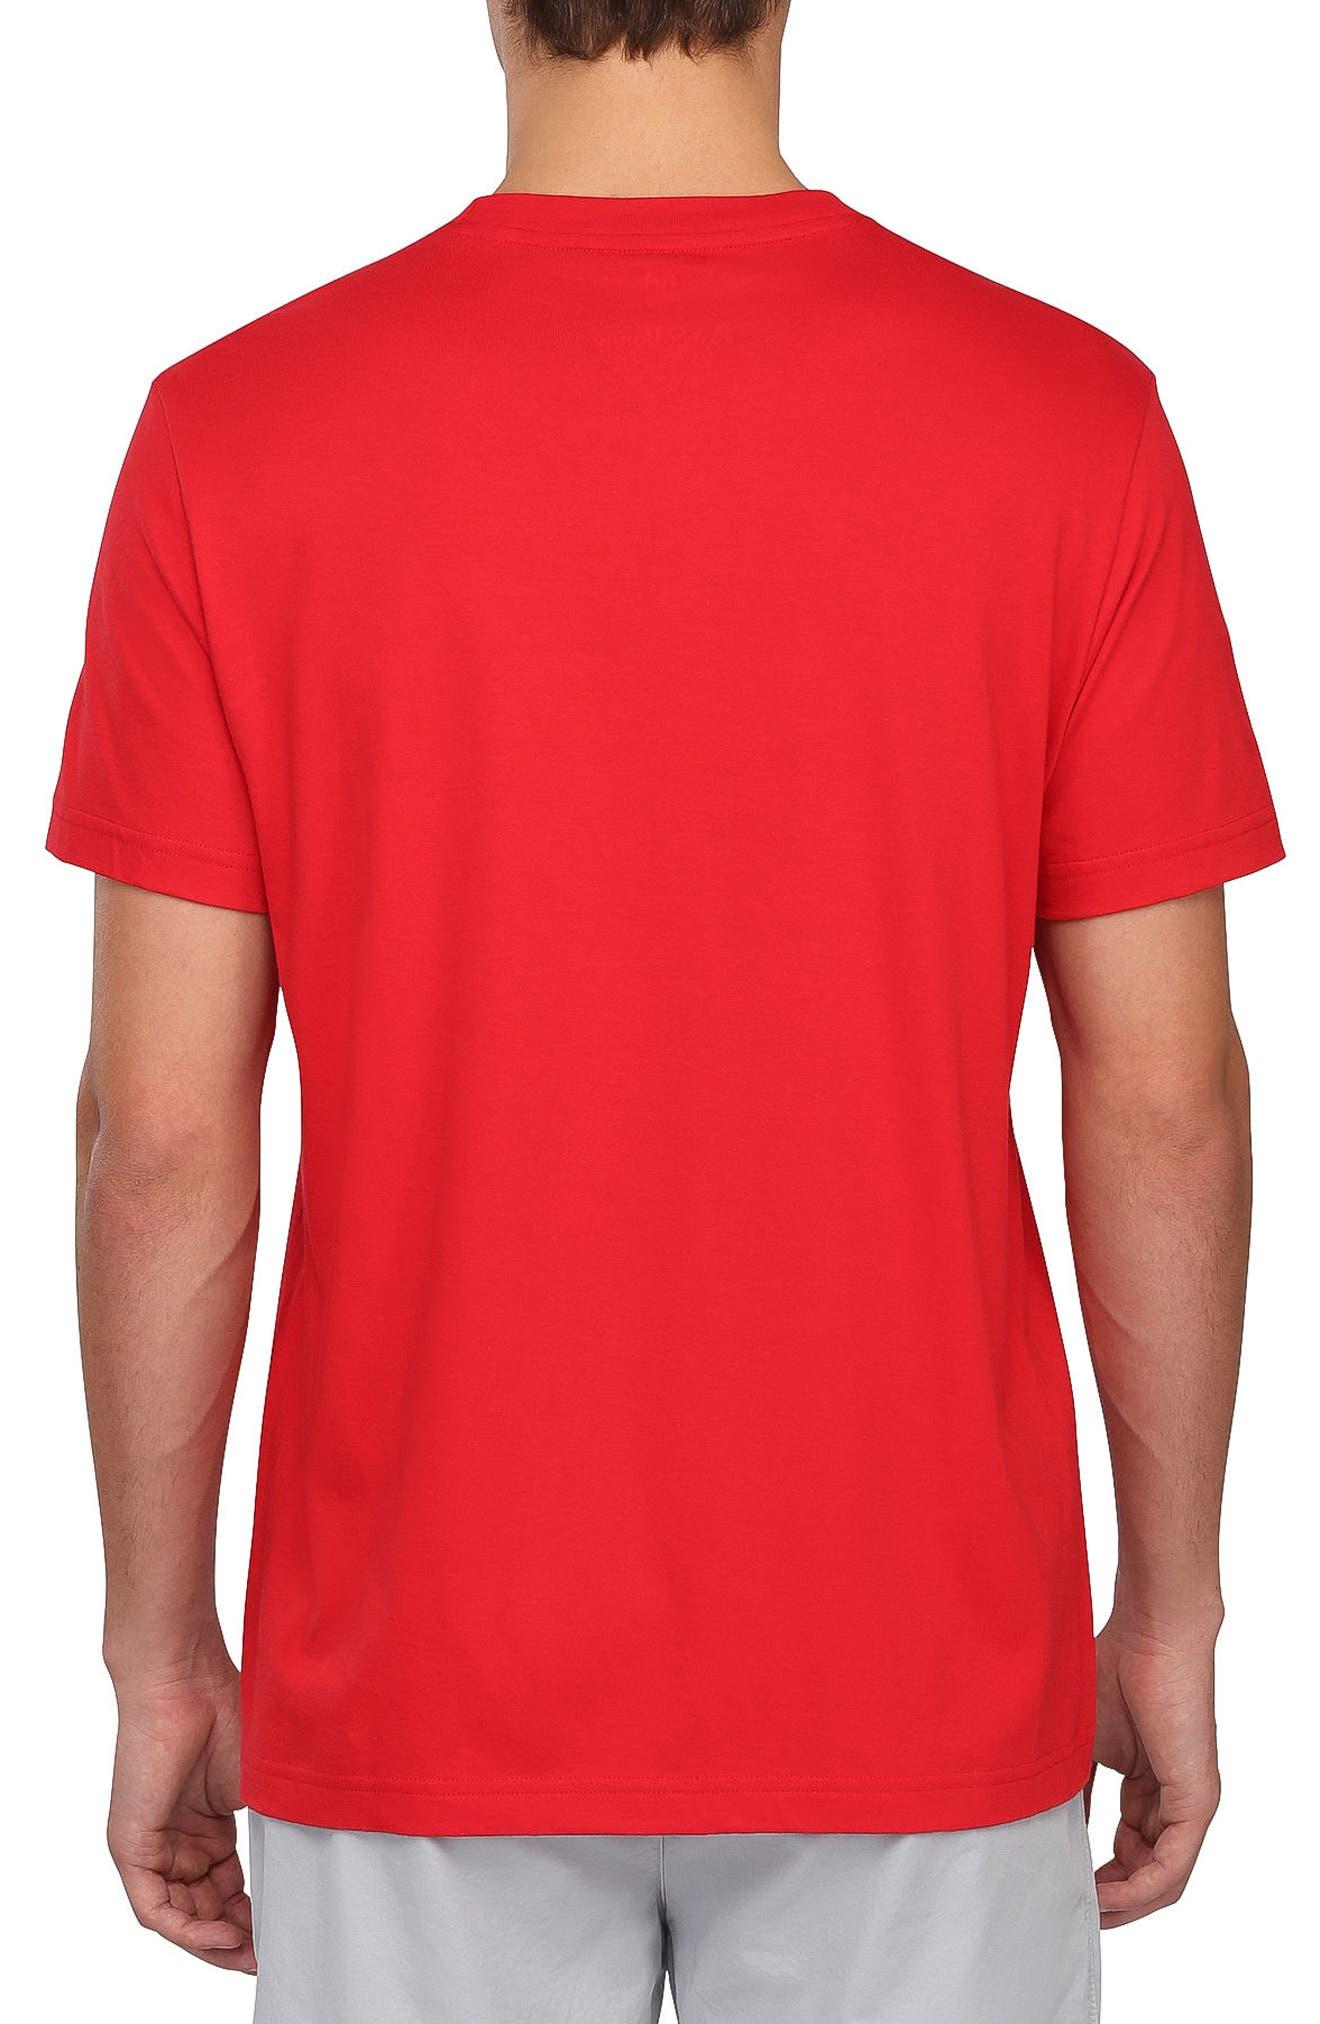 Legend Graphic T-Shirt,                             Alternate thumbnail 2, color,                             Brilliant Red